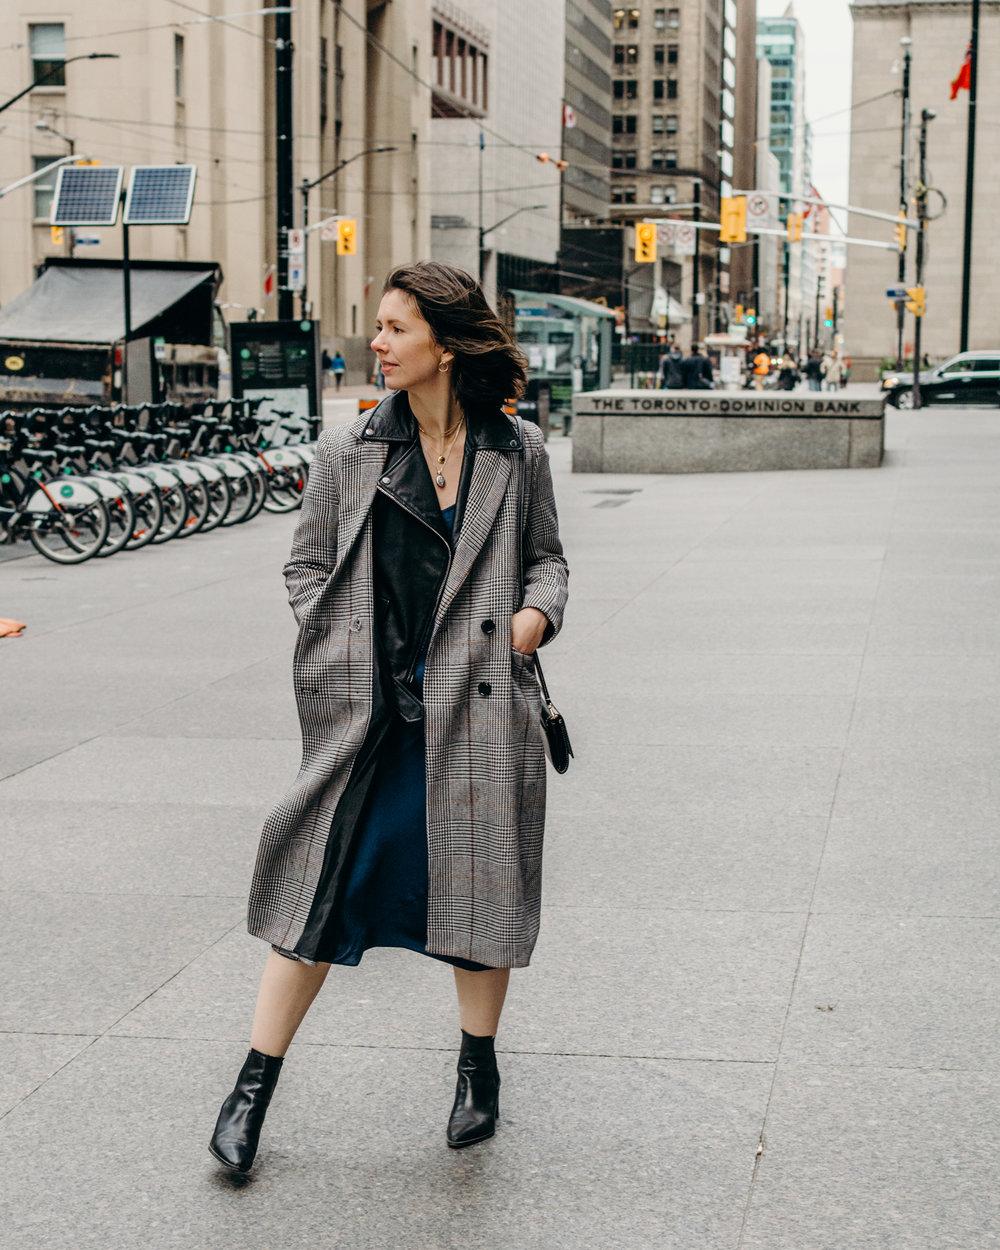 aritzia christine dress style apotheca slip dress fashion blogger style blogger zara booties